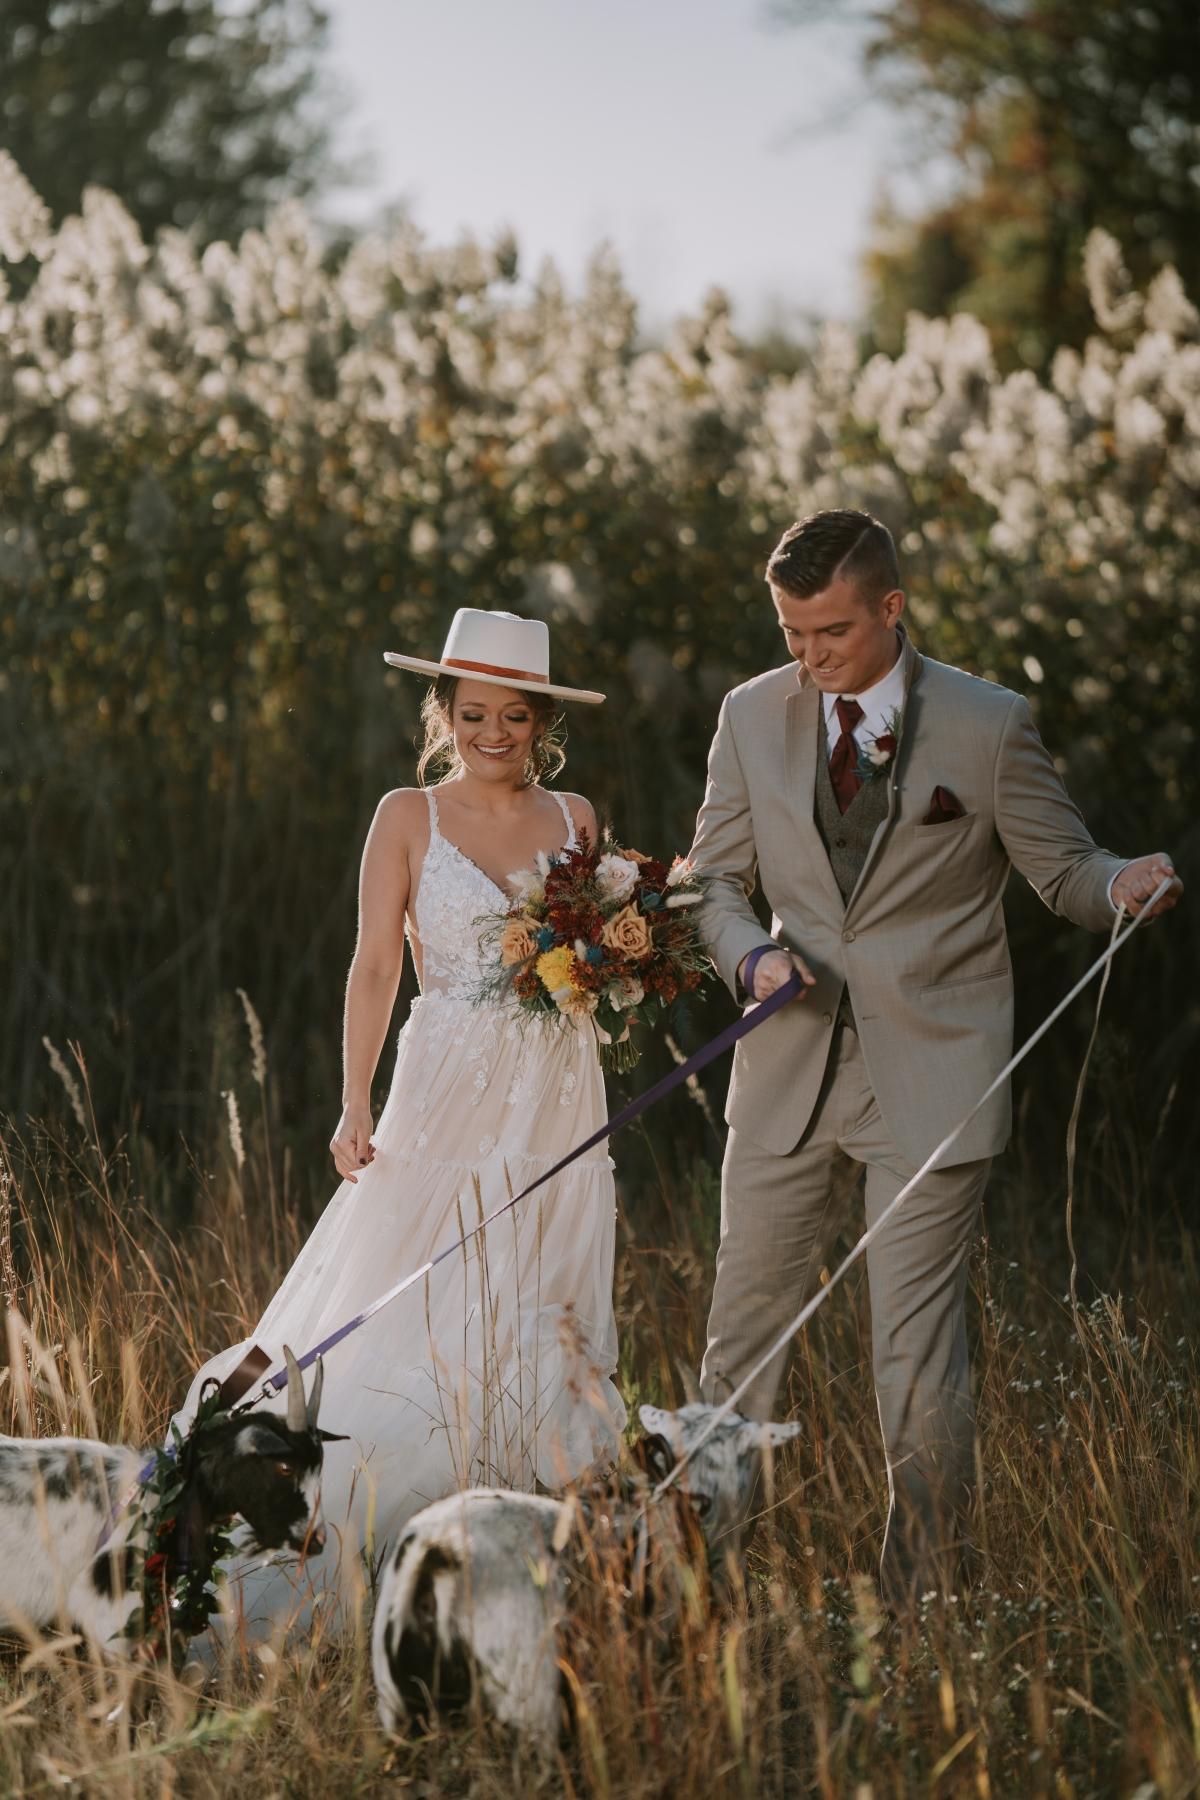 Millennium Moments Chicago Wedding Photographer 24